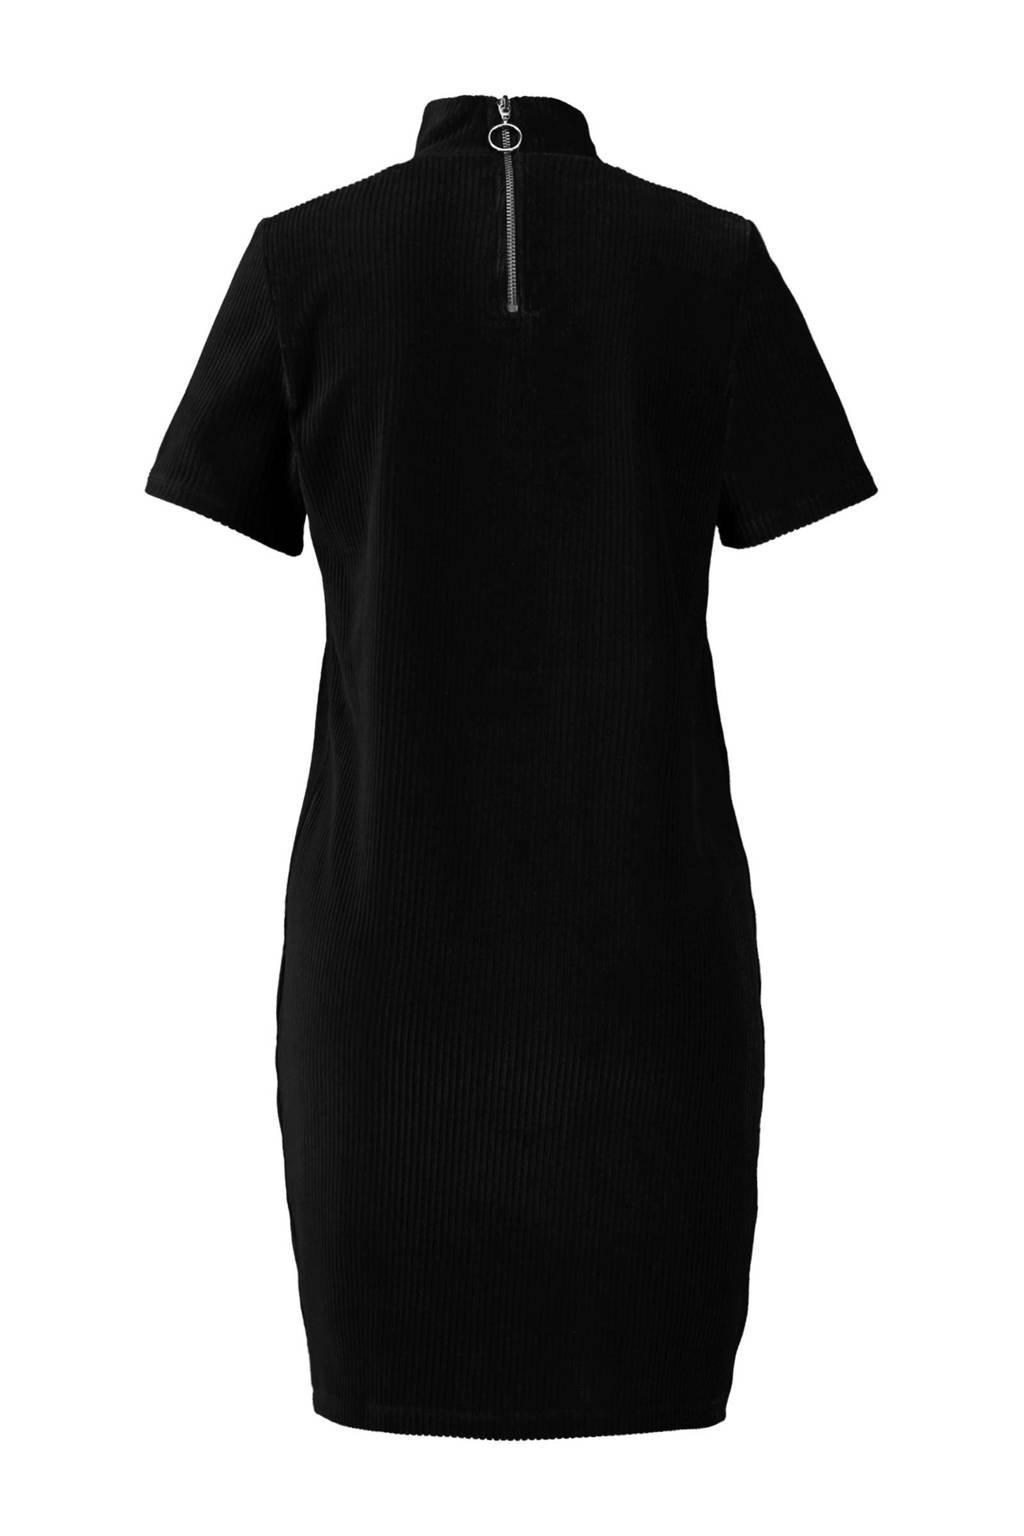 America Today jurk Dahlia zwart, Zwart